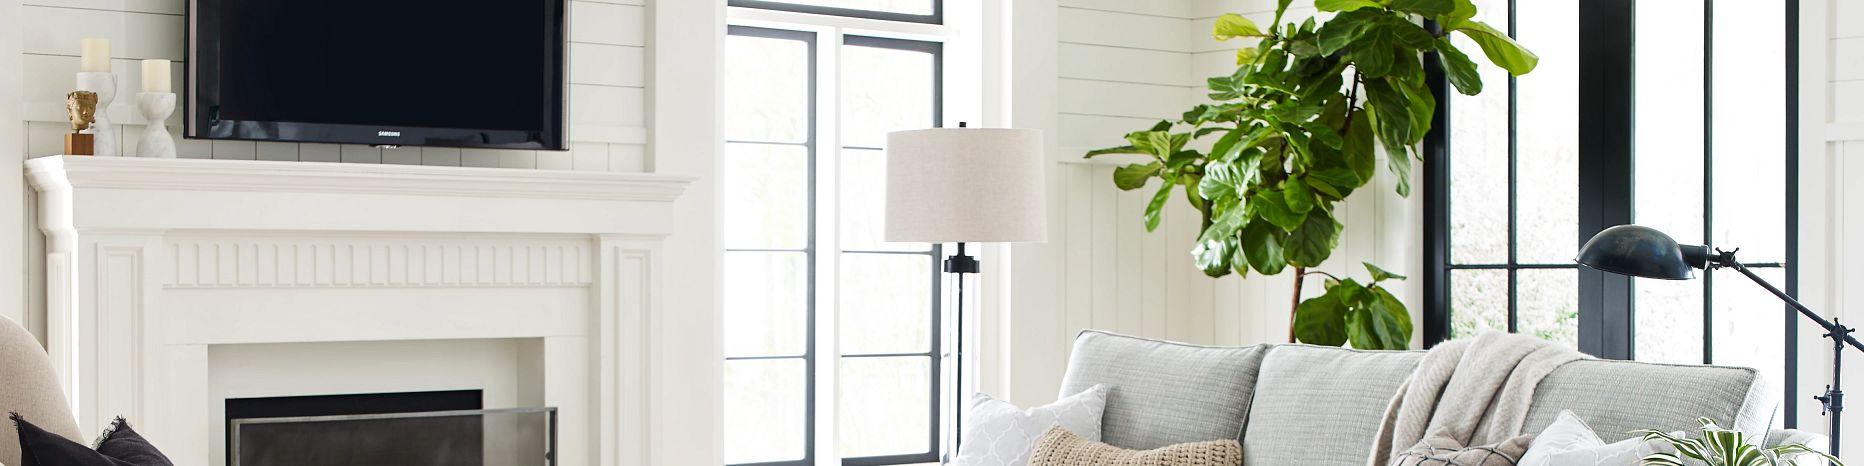 Hardwood-ScufResist-Platinum-Westminster-Maple-FH813-05090-Living-Room-2021